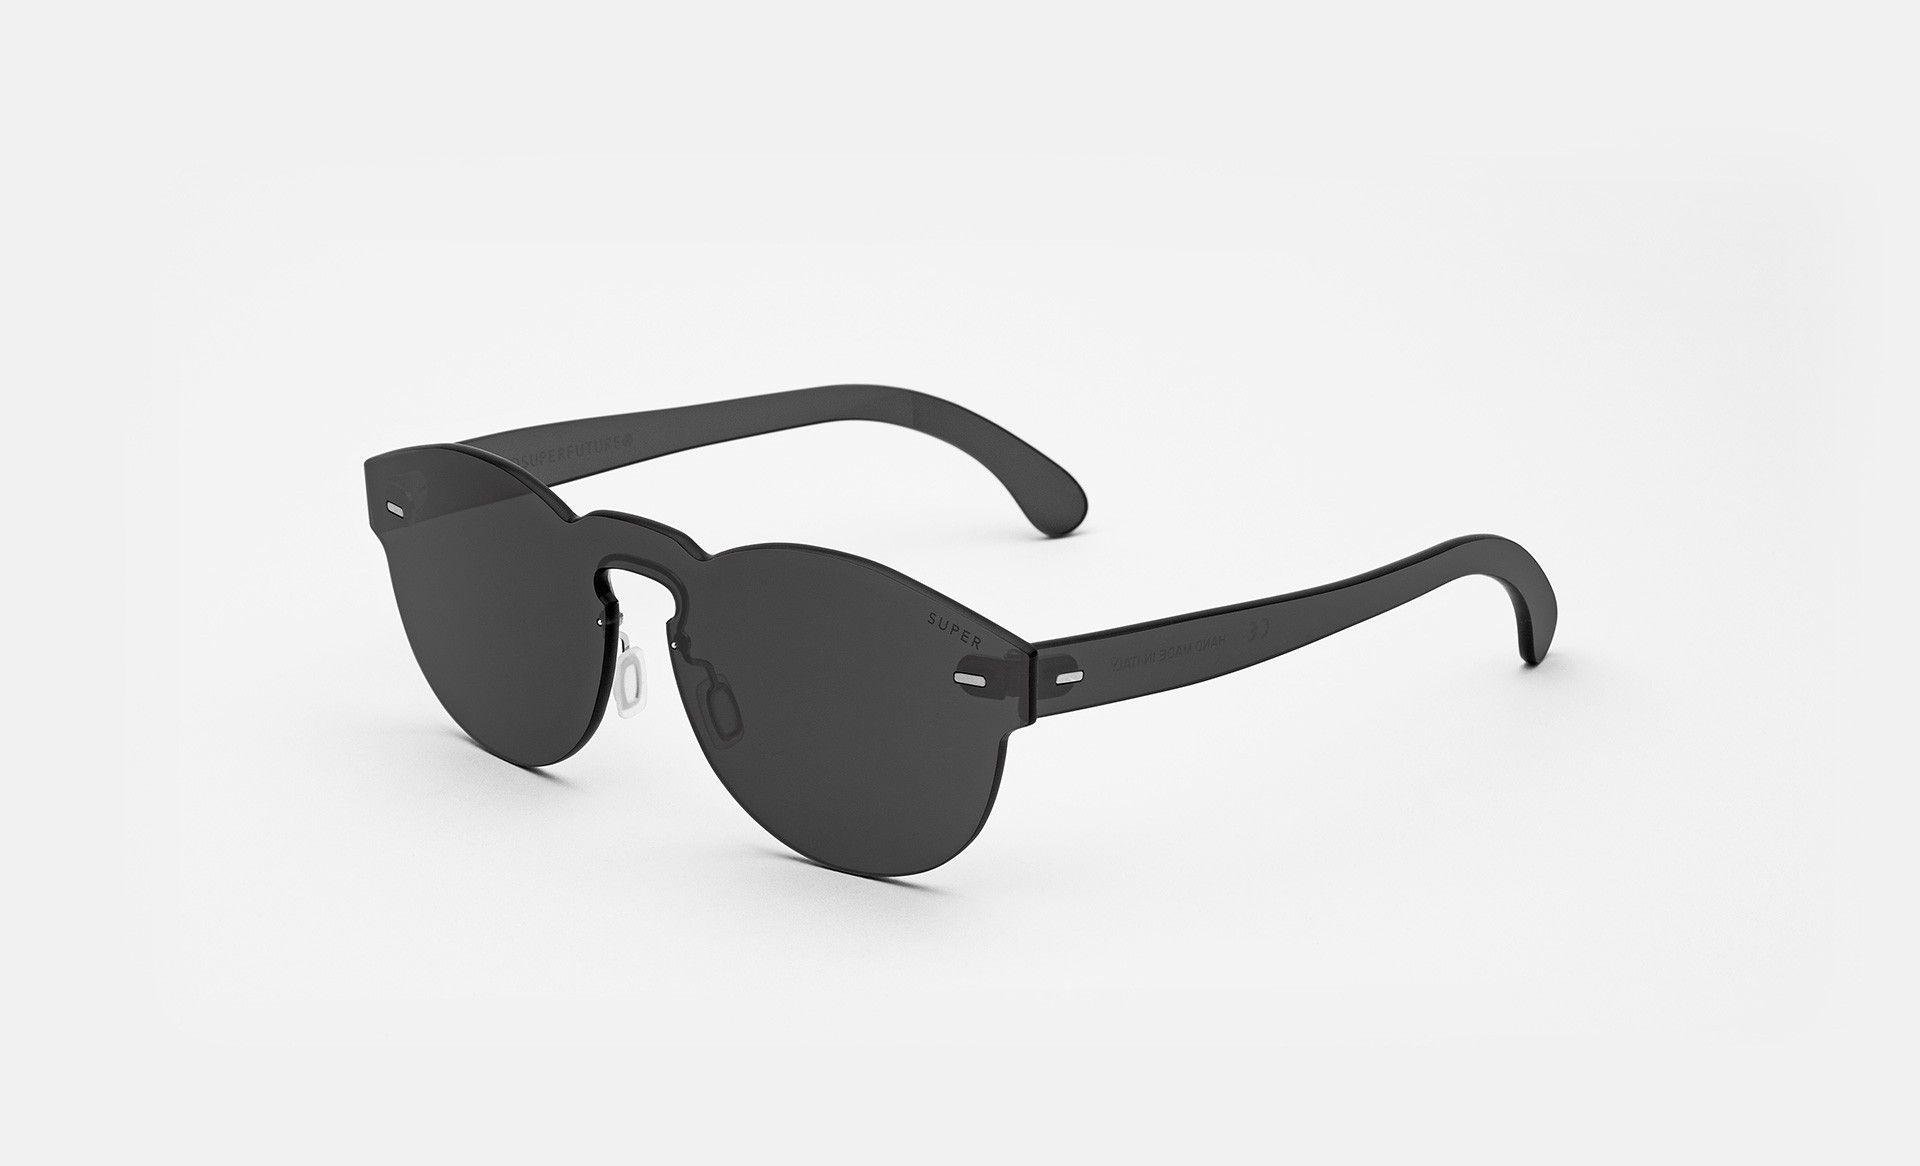 RETROSUPERFUTURE - TUTTOLENTE PALOMA BLACK | ...accessories. | Pinterest